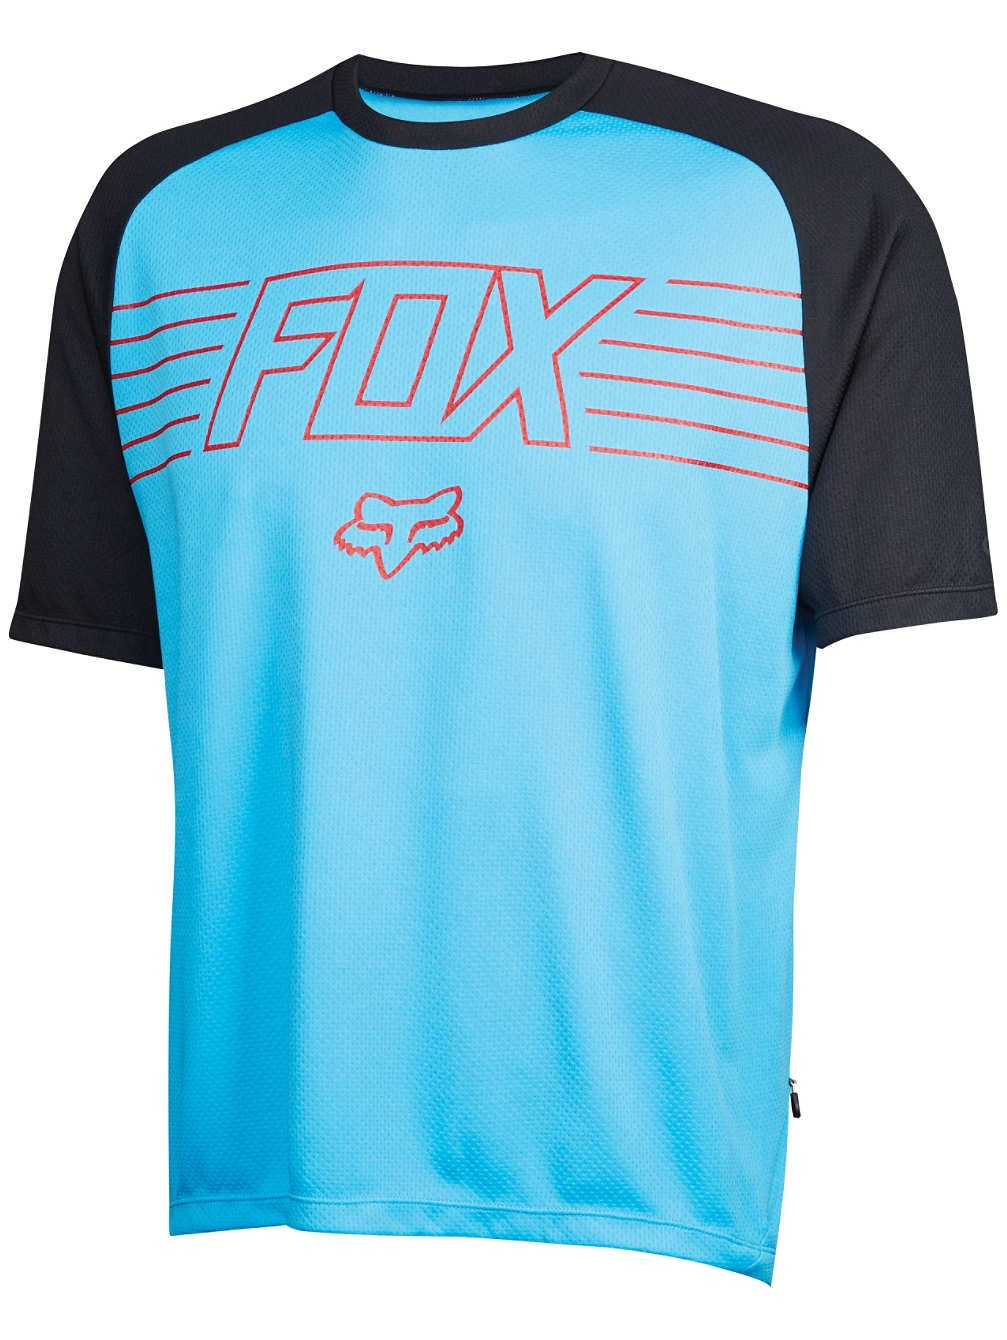 Fox Head Ranger Prints Short Sleeve MTB Bike Jersey Shirt (Cyan, M)